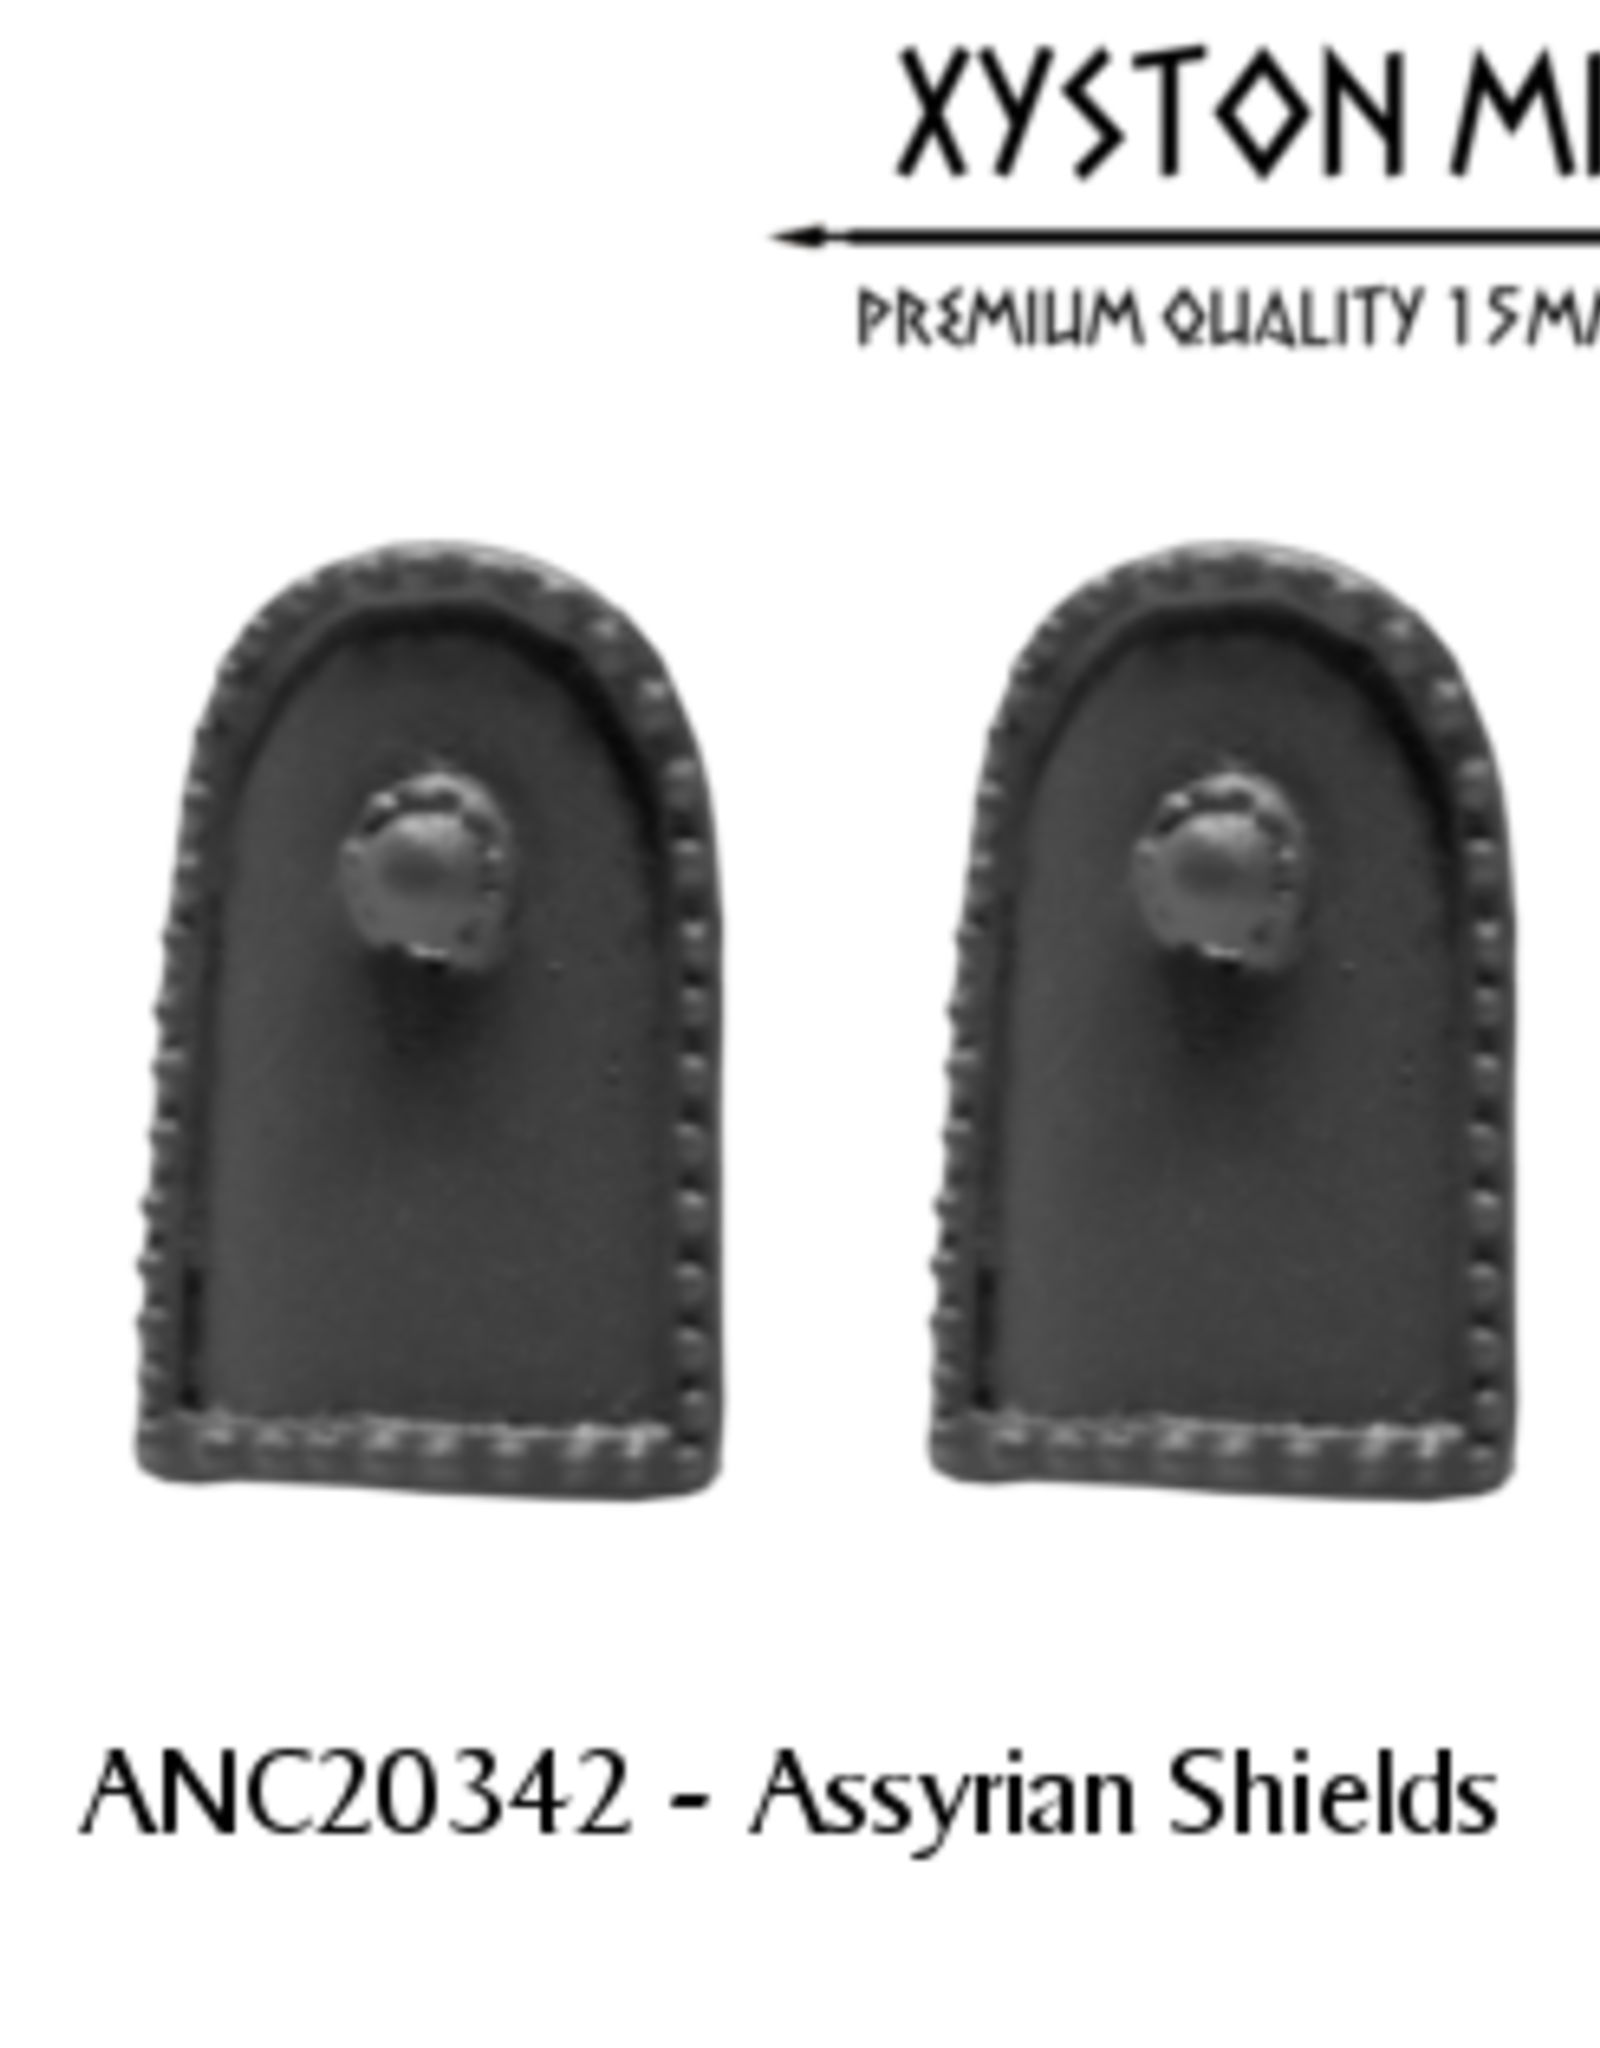 Xyston ANC20342 - Assyrian Shields (24)